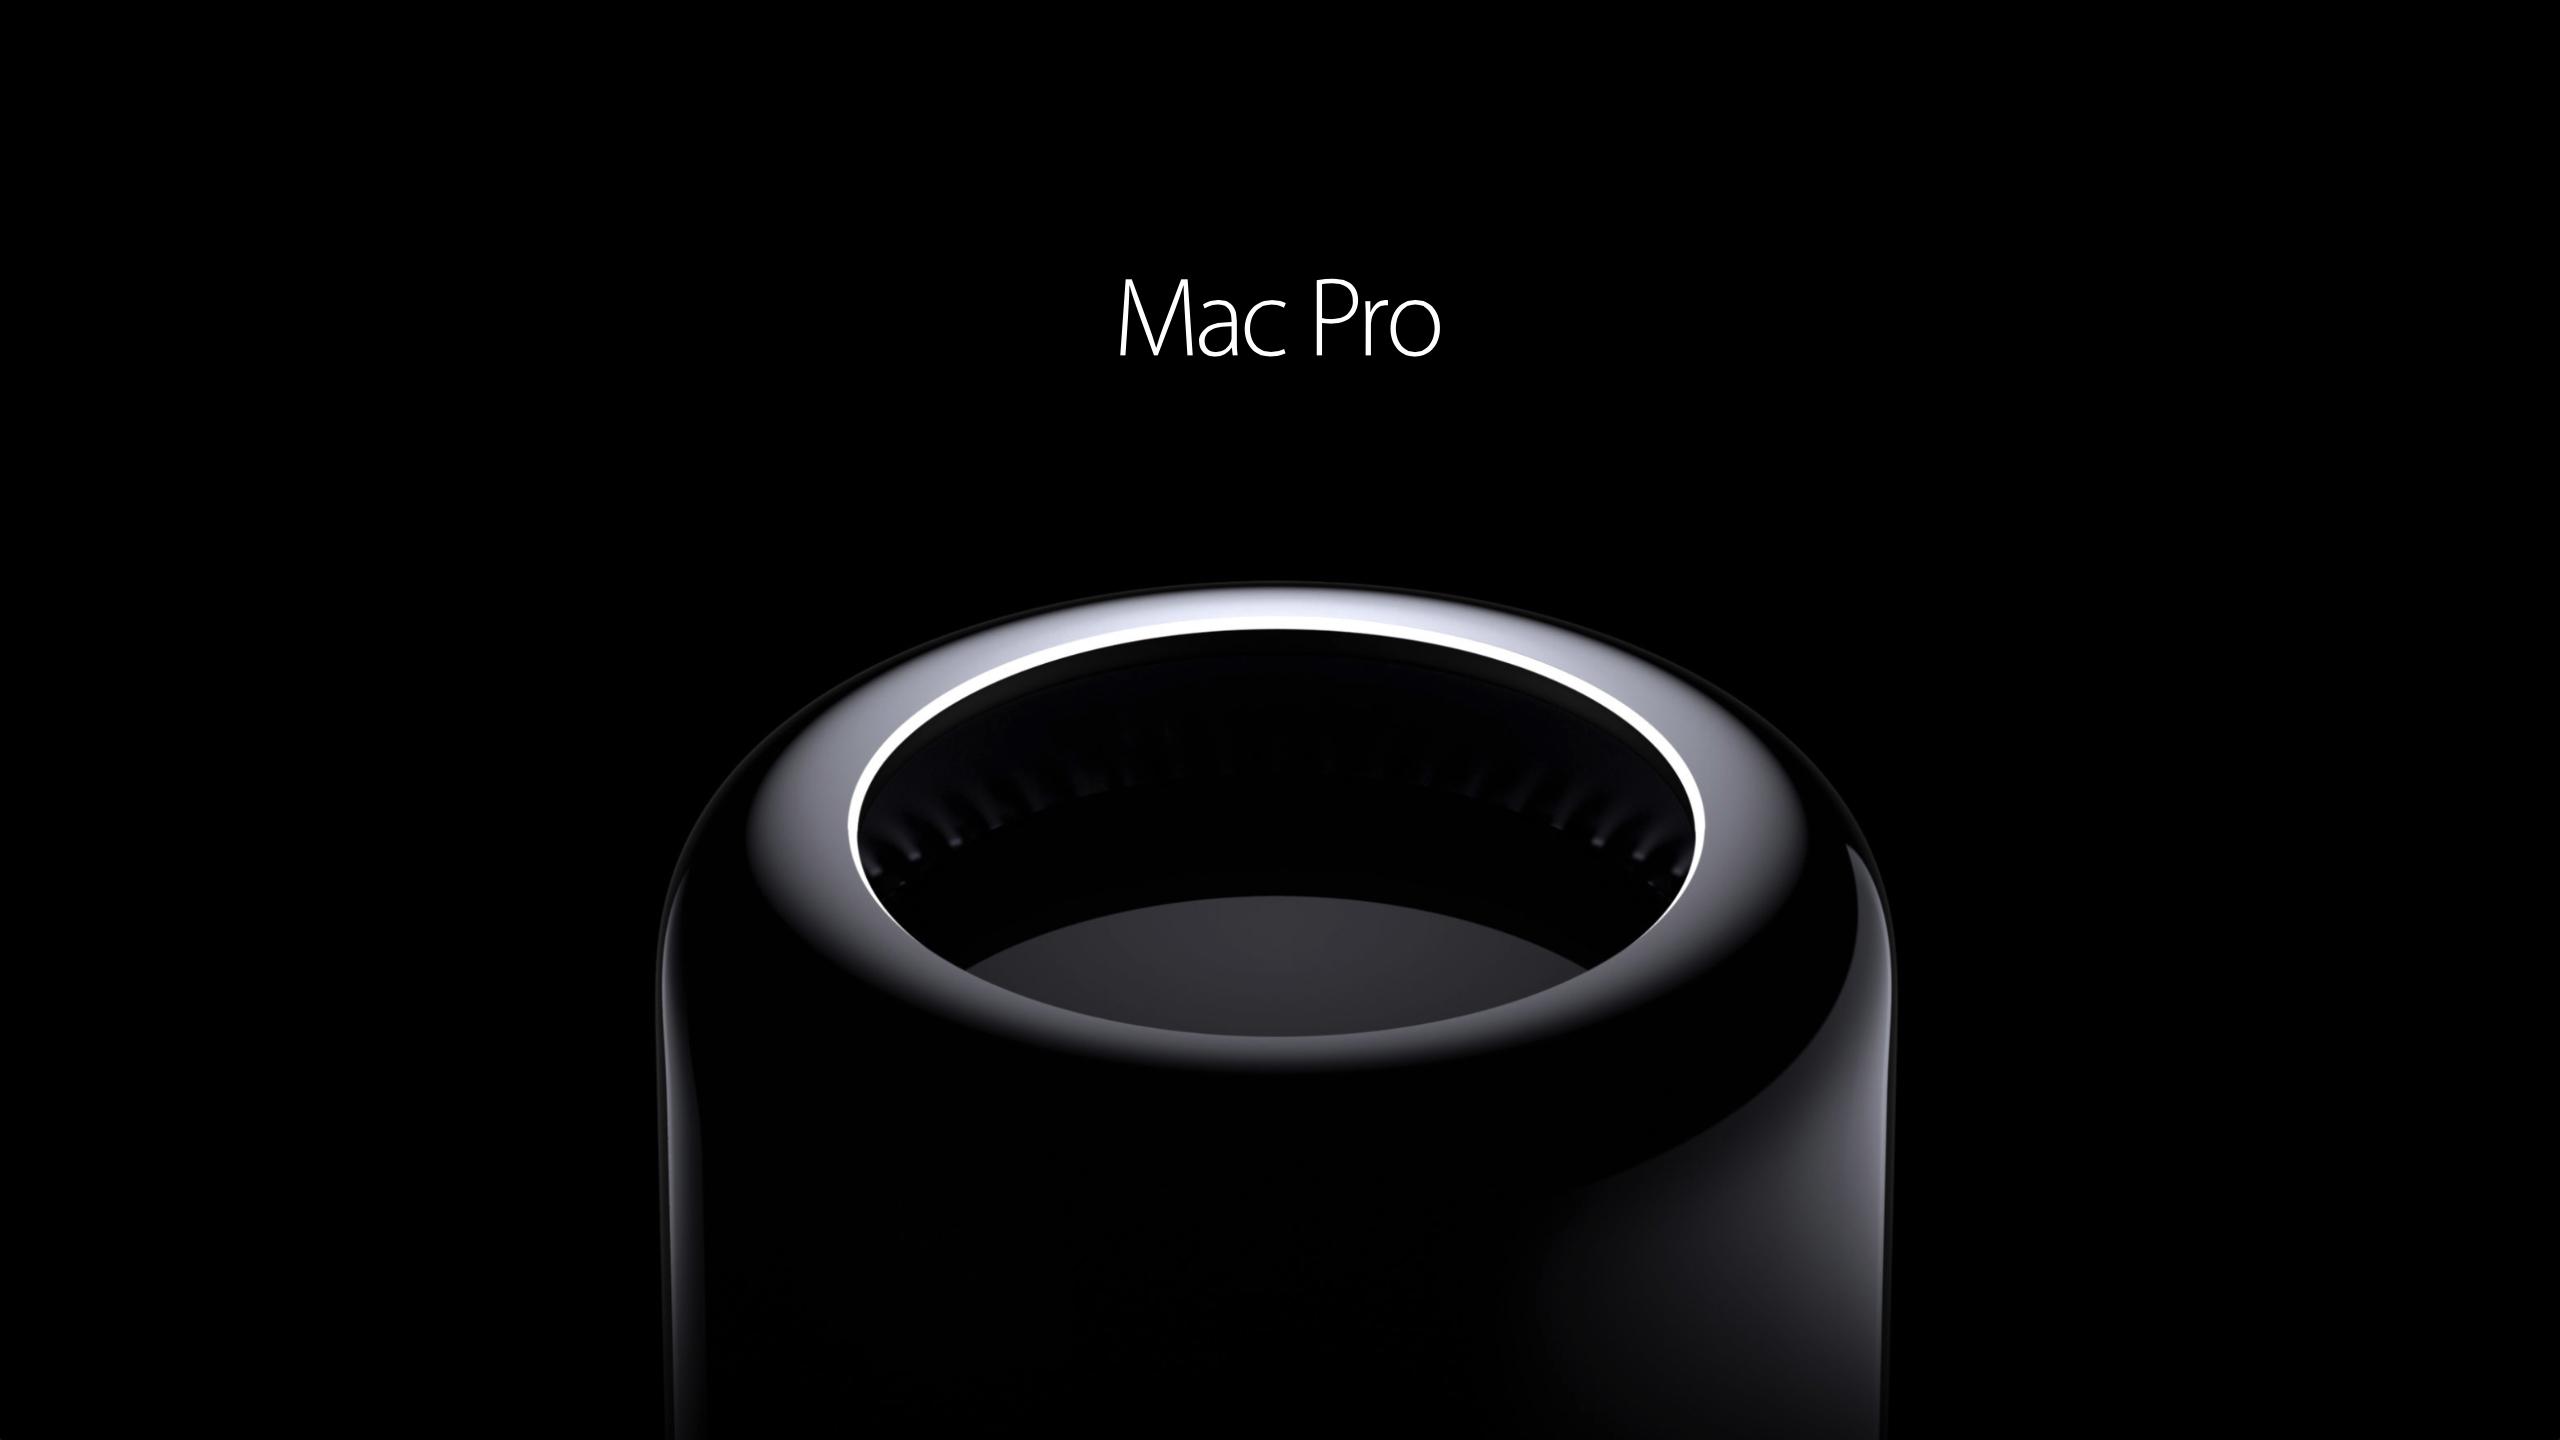 Apple wallpaper Mac Pro 2014 gloss black black background a new 2560x1440